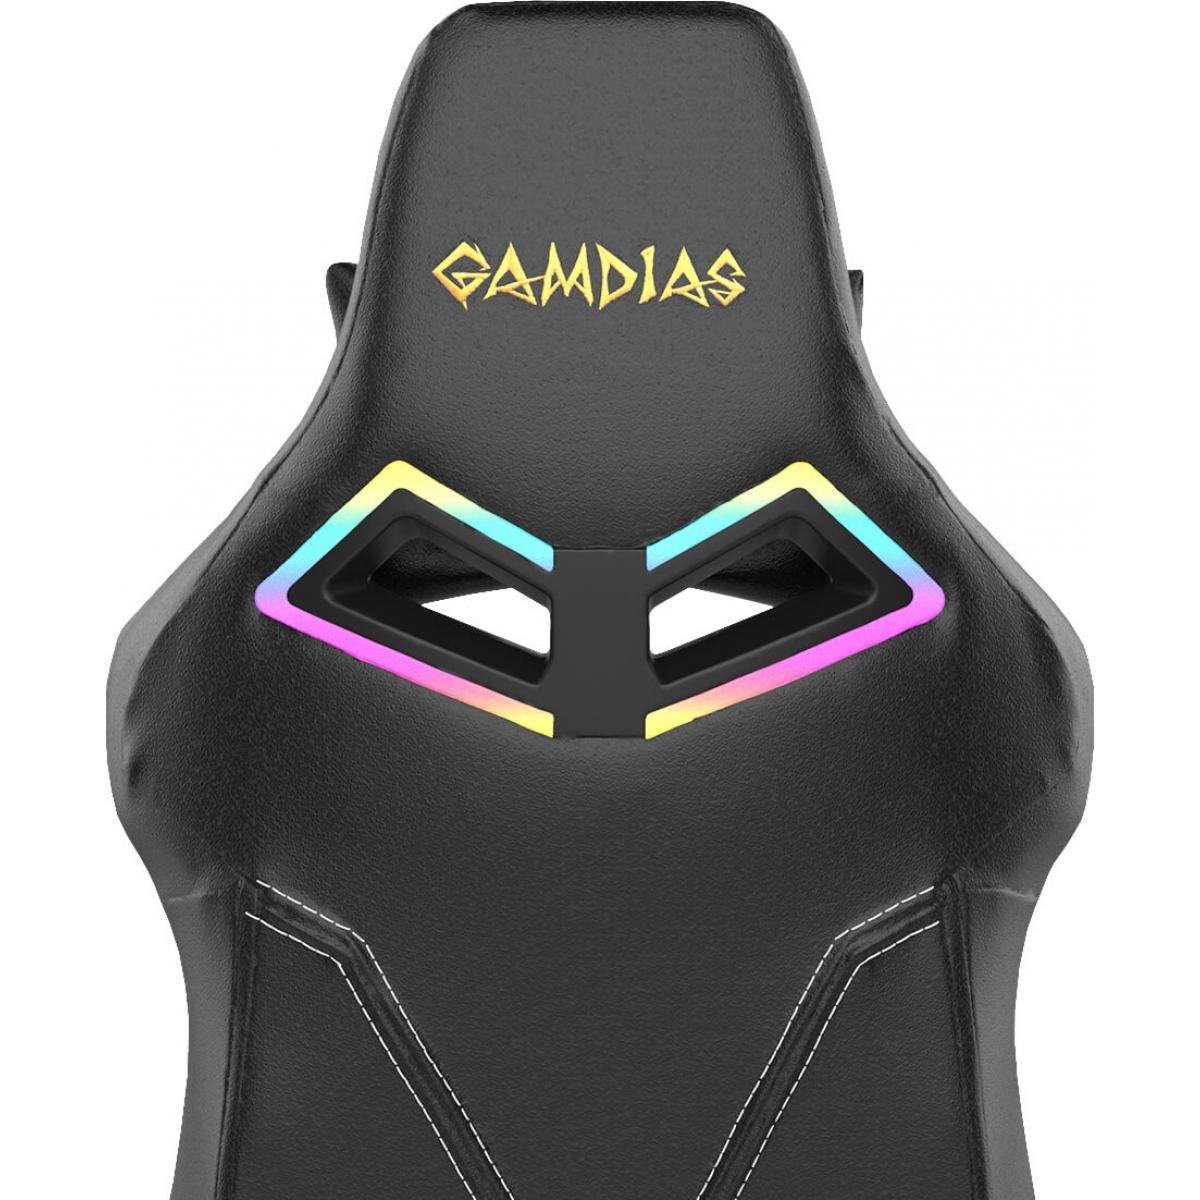 Cadeira Gamer Gamdias Achilles RGB M1A, Black, GD-ACHILLESM1ALB